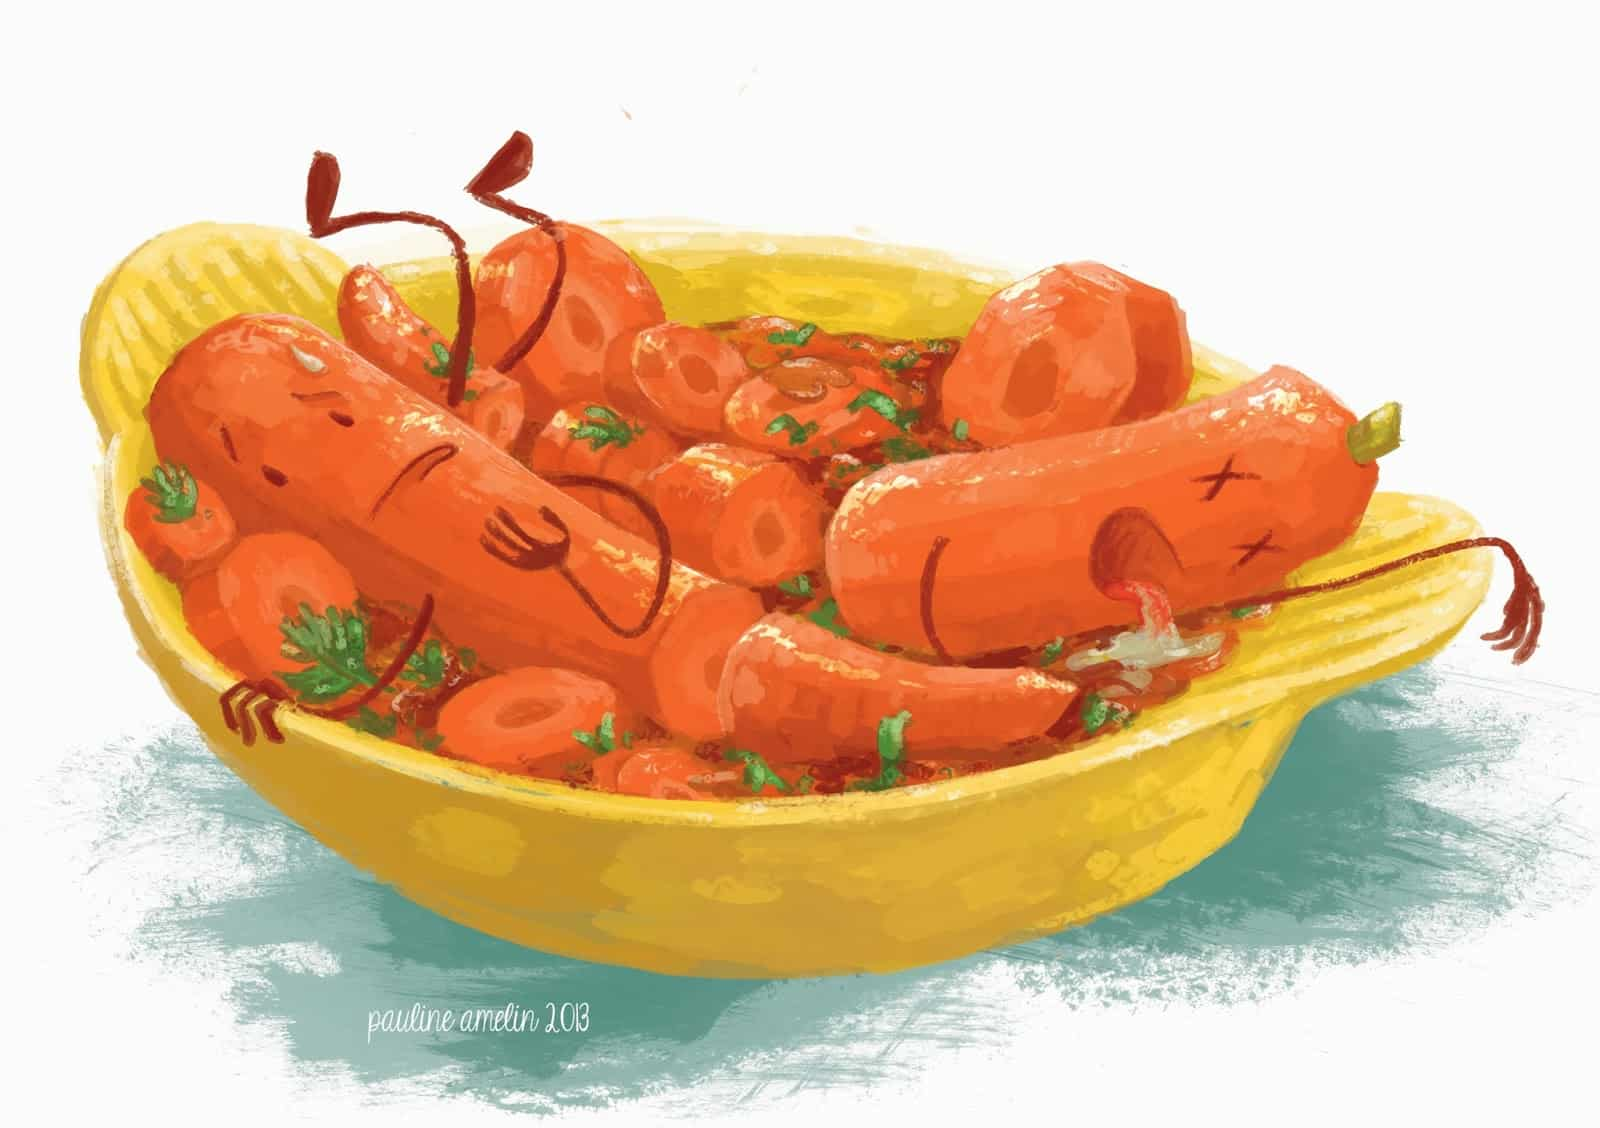 les carottes sont cuites alpine french school. Black Bedroom Furniture Sets. Home Design Ideas